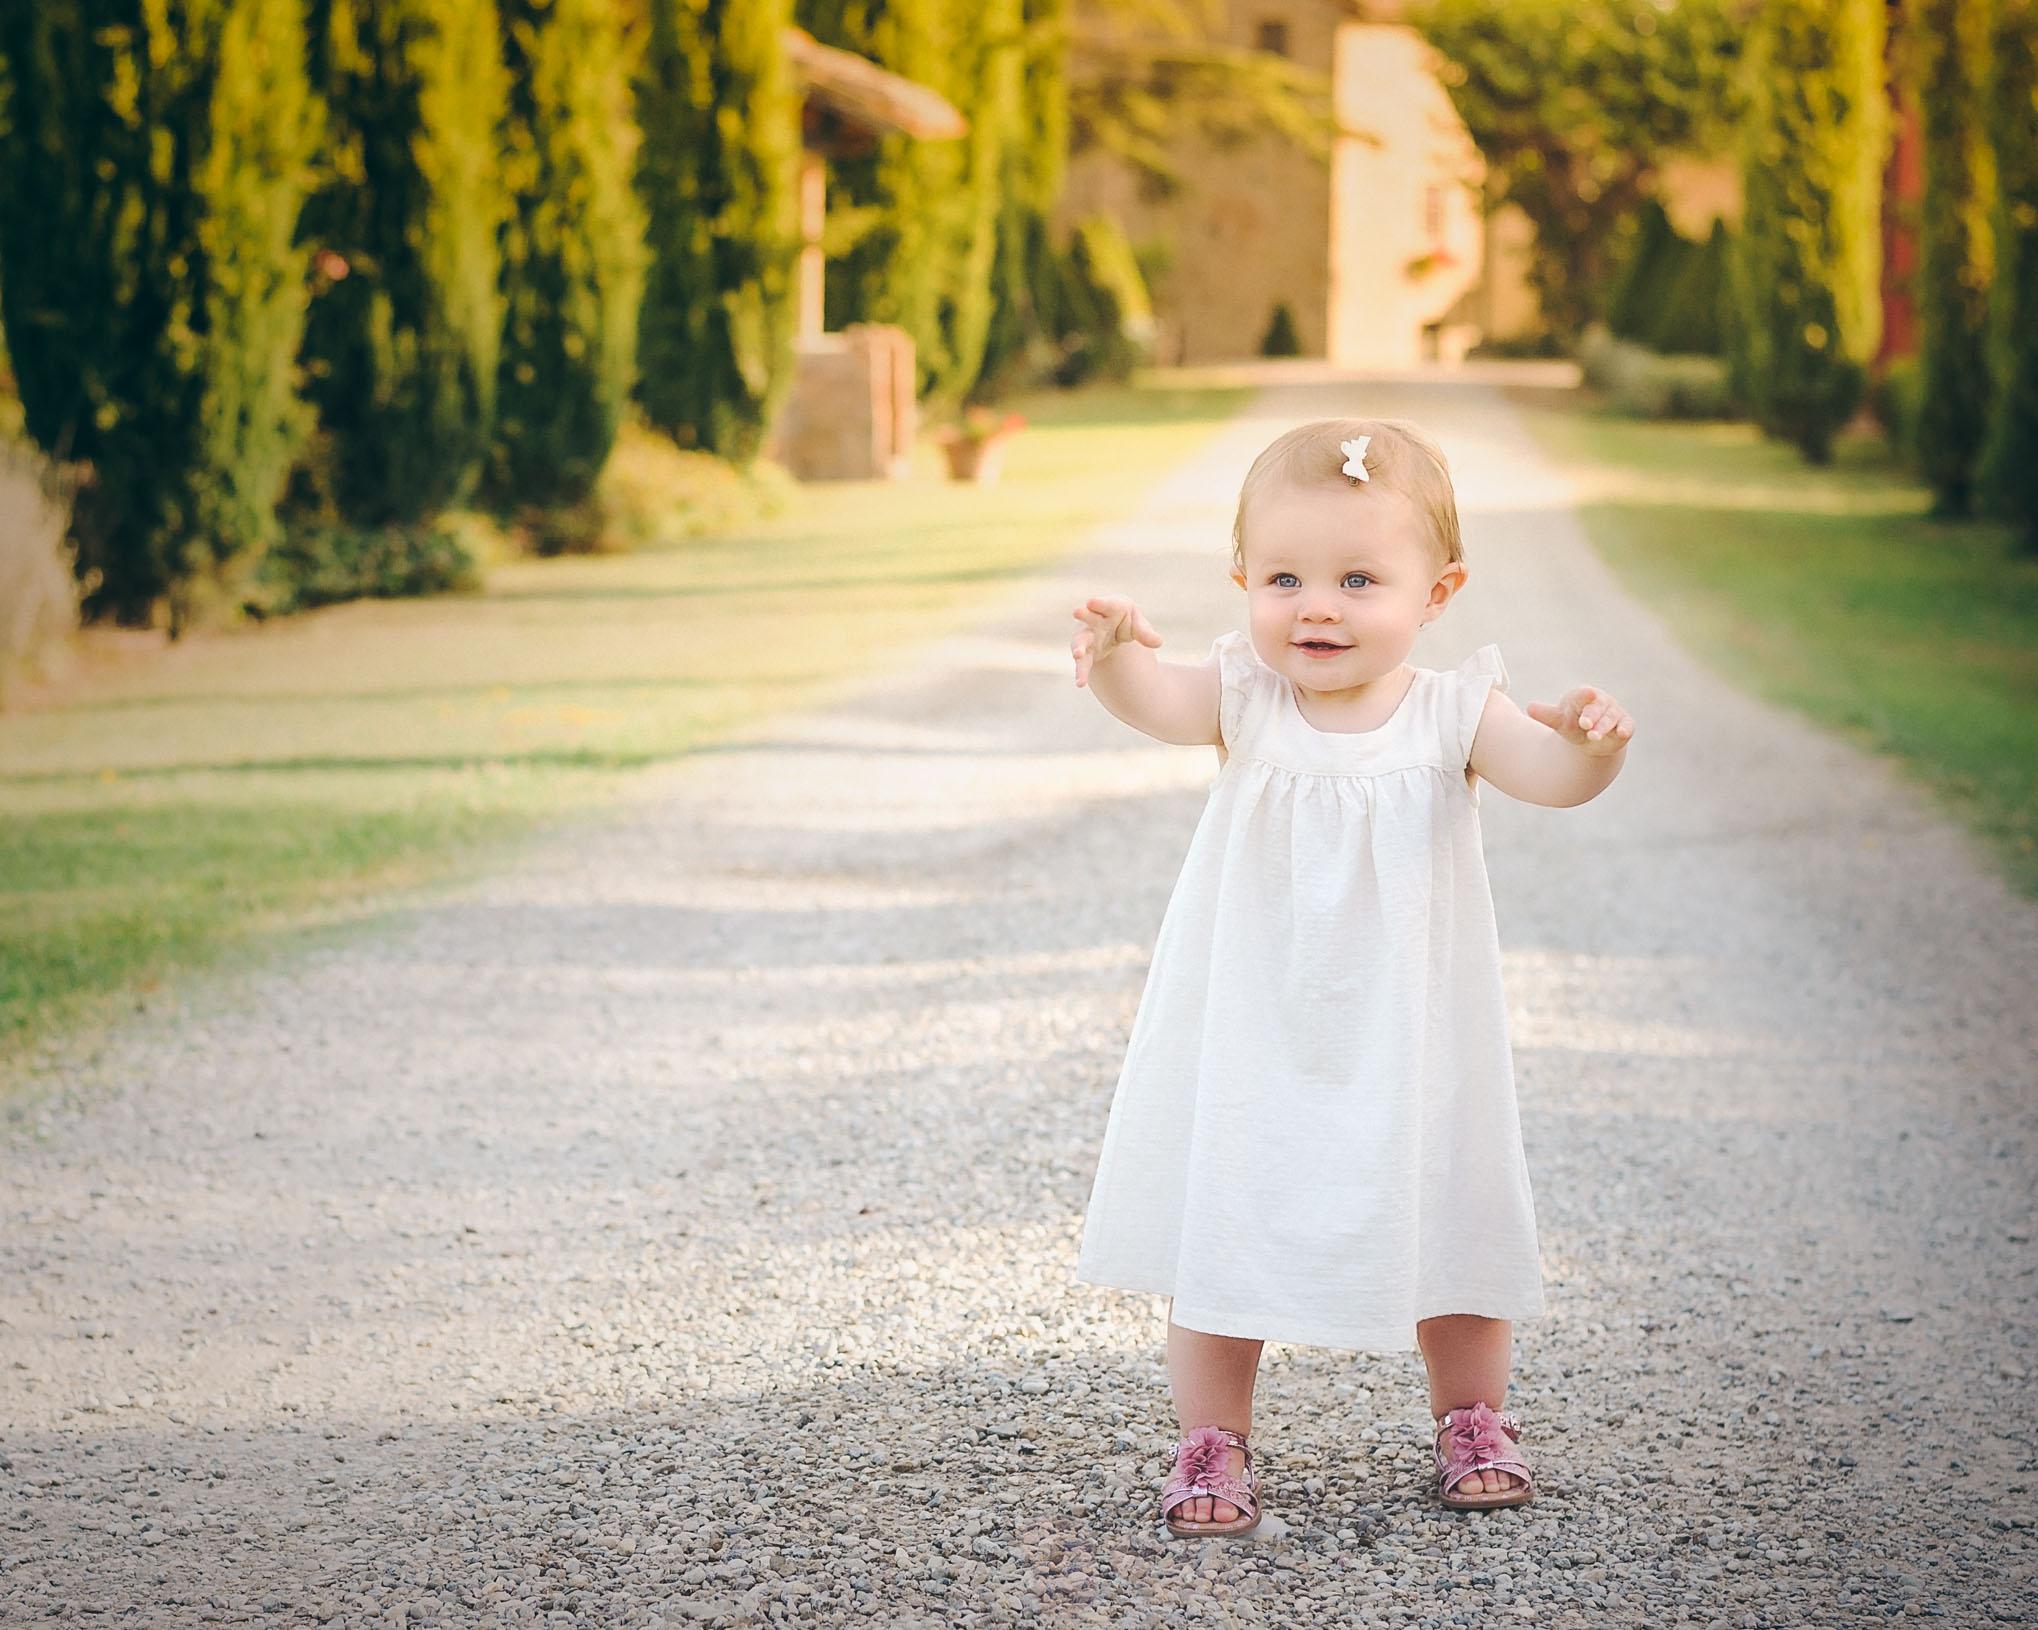 Toddler portrait at Tuscan Vineyard | Children's Photography